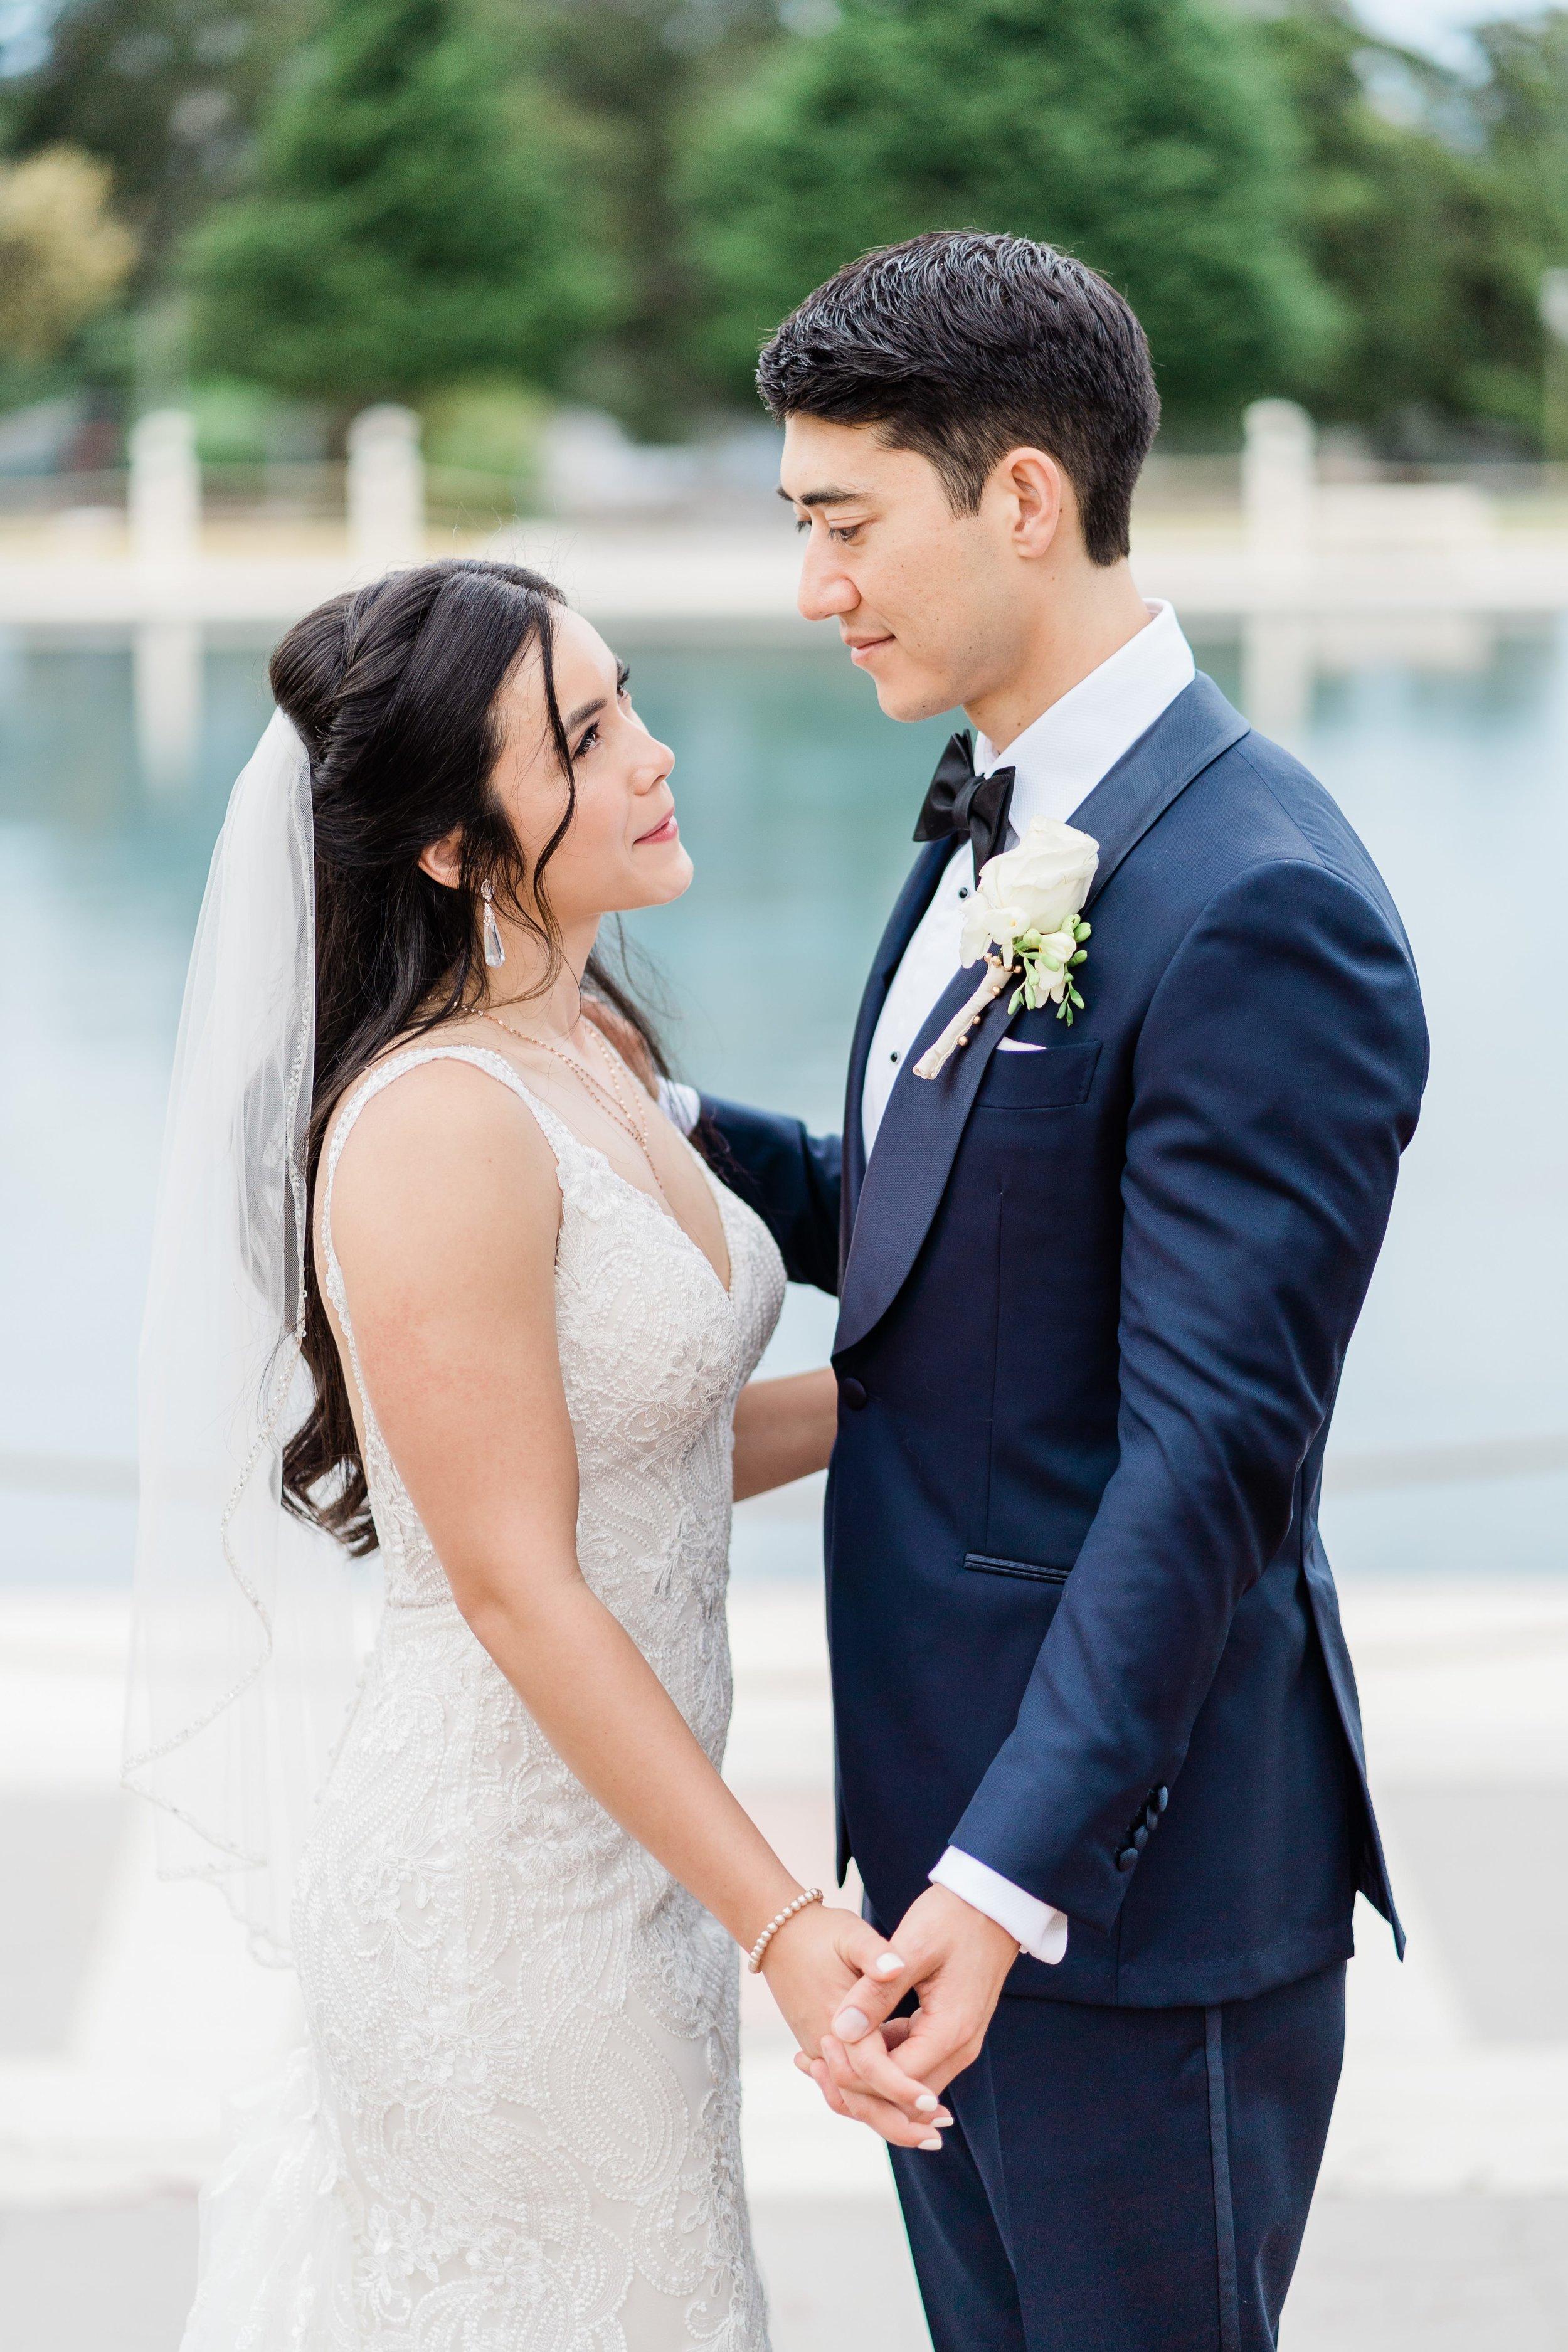 naval-postgraduate-school-wedding-in-monterey-ca-drew-zavala-photo-bobby-briana-min.jpg